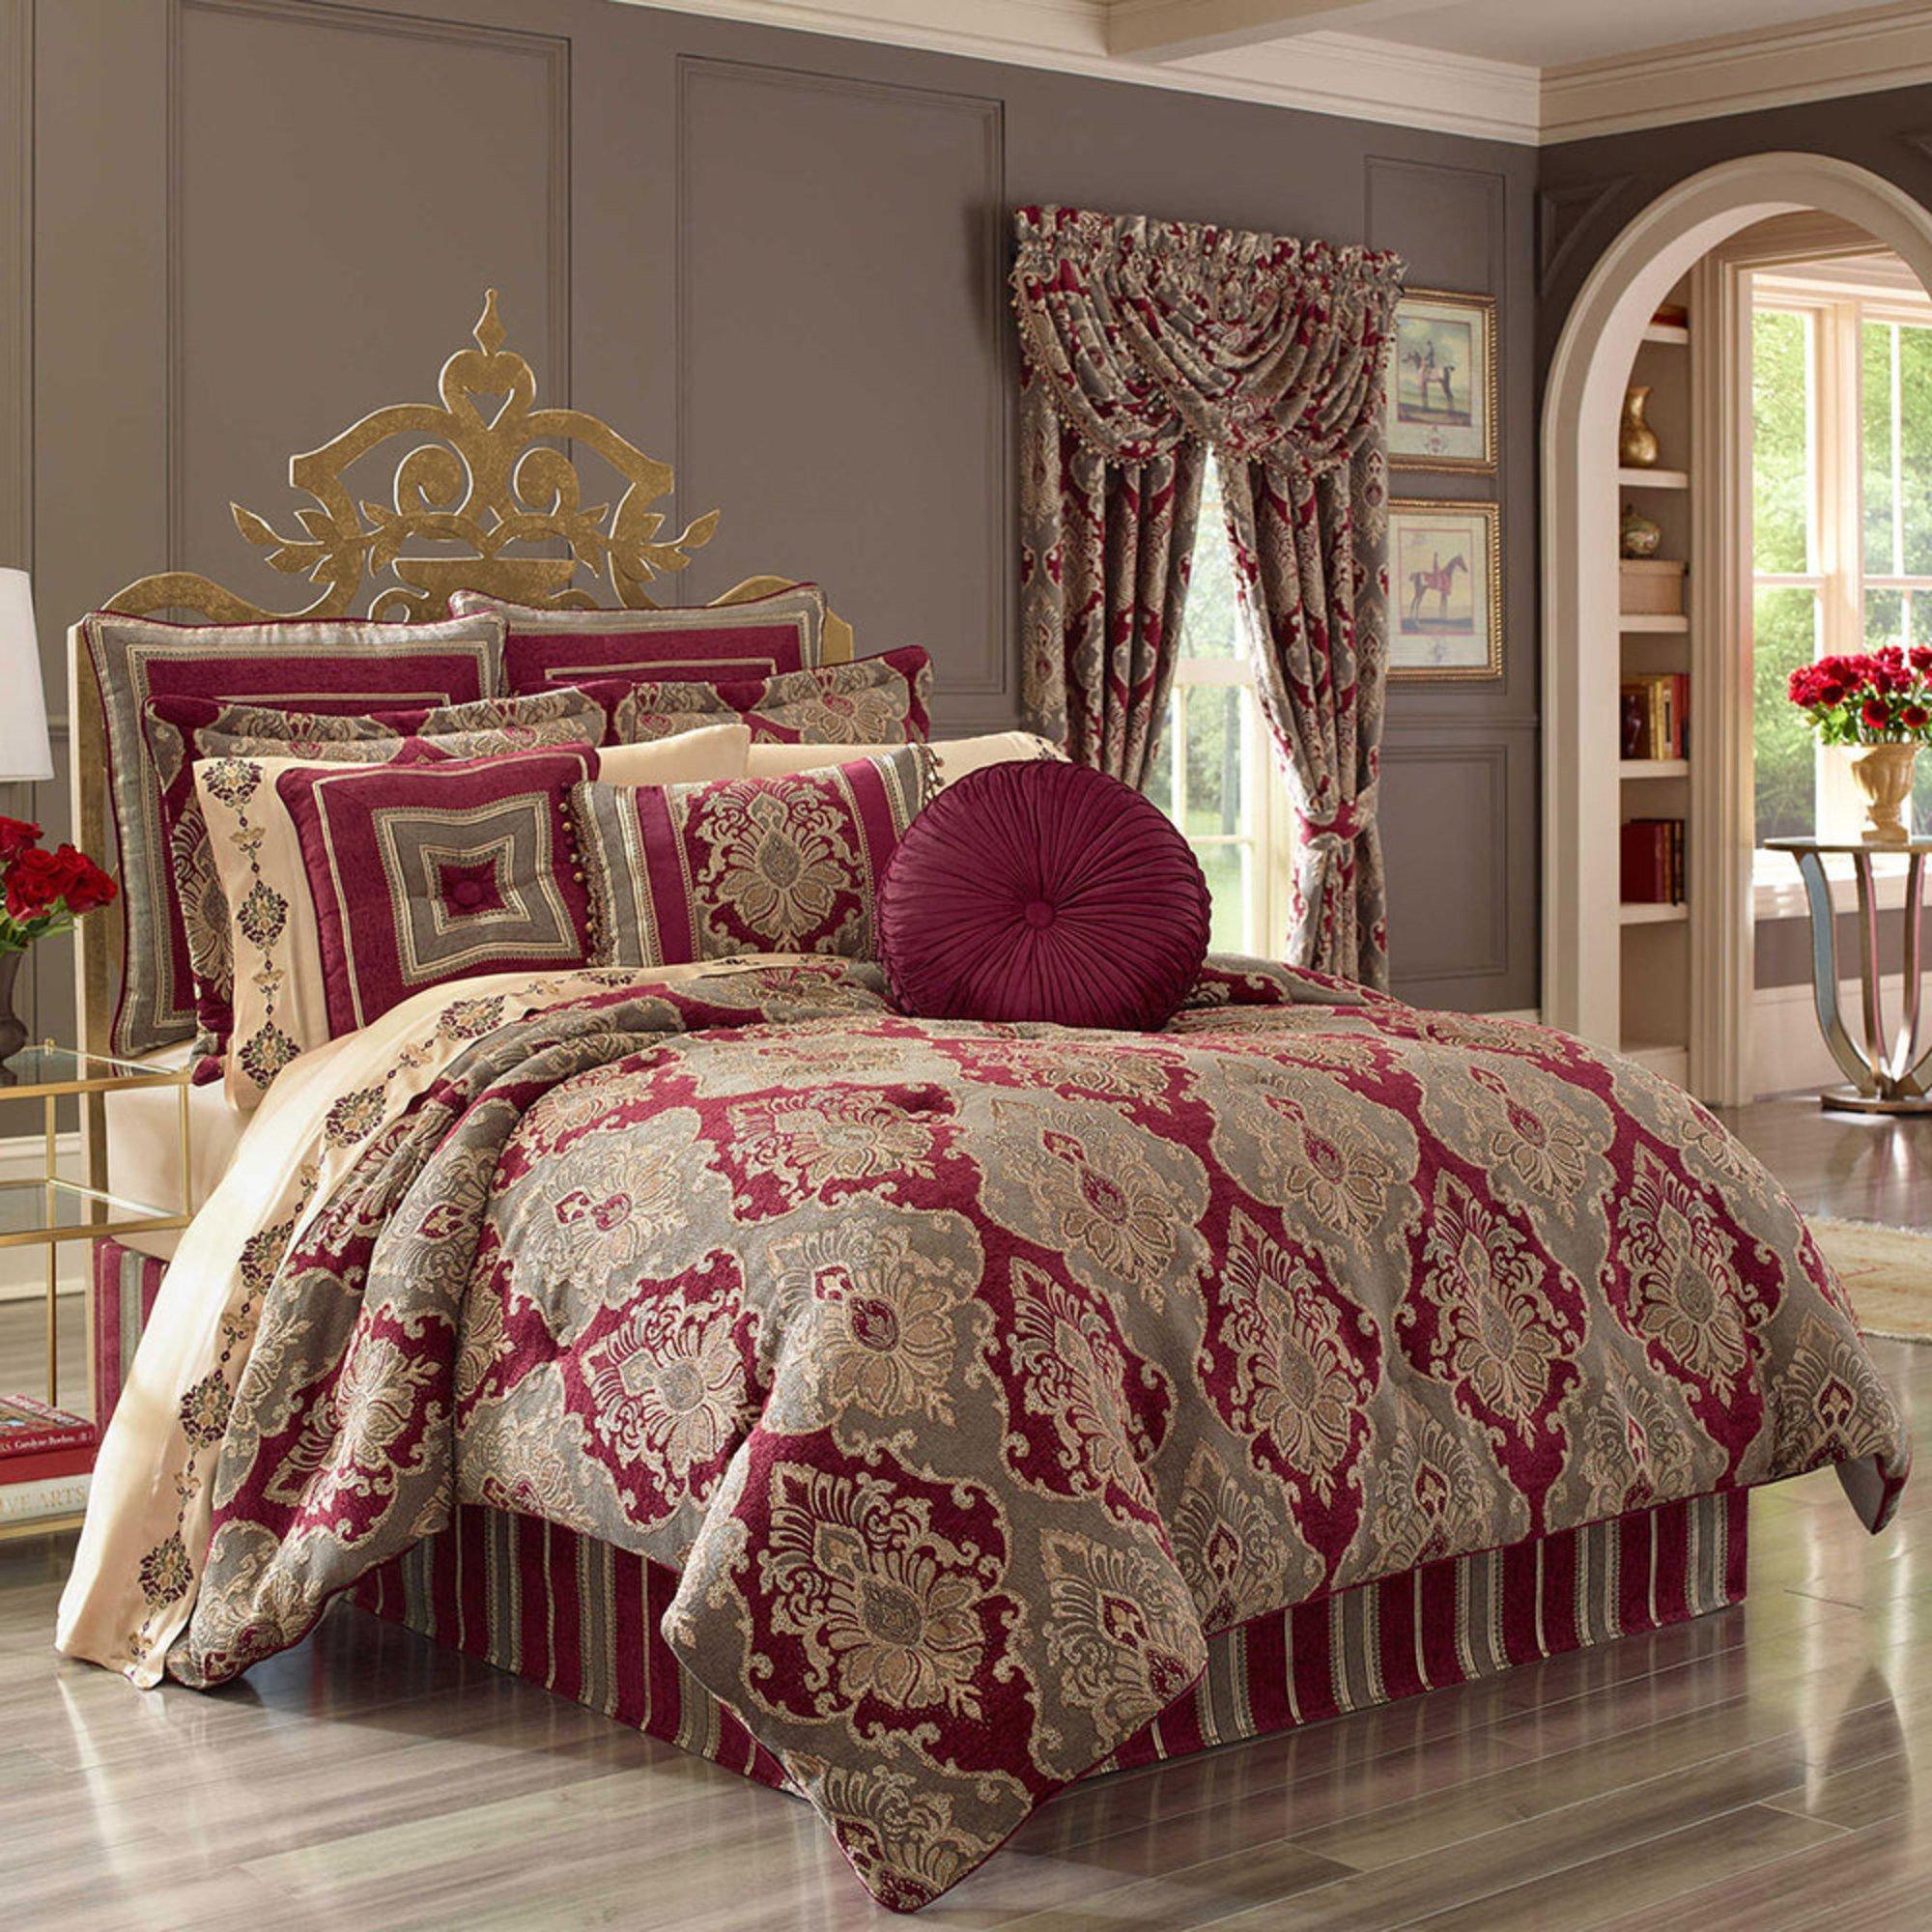 red comforter sets king J Queen Crimson Red Comforter Set   King | Comforter Sets  red comforter sets king